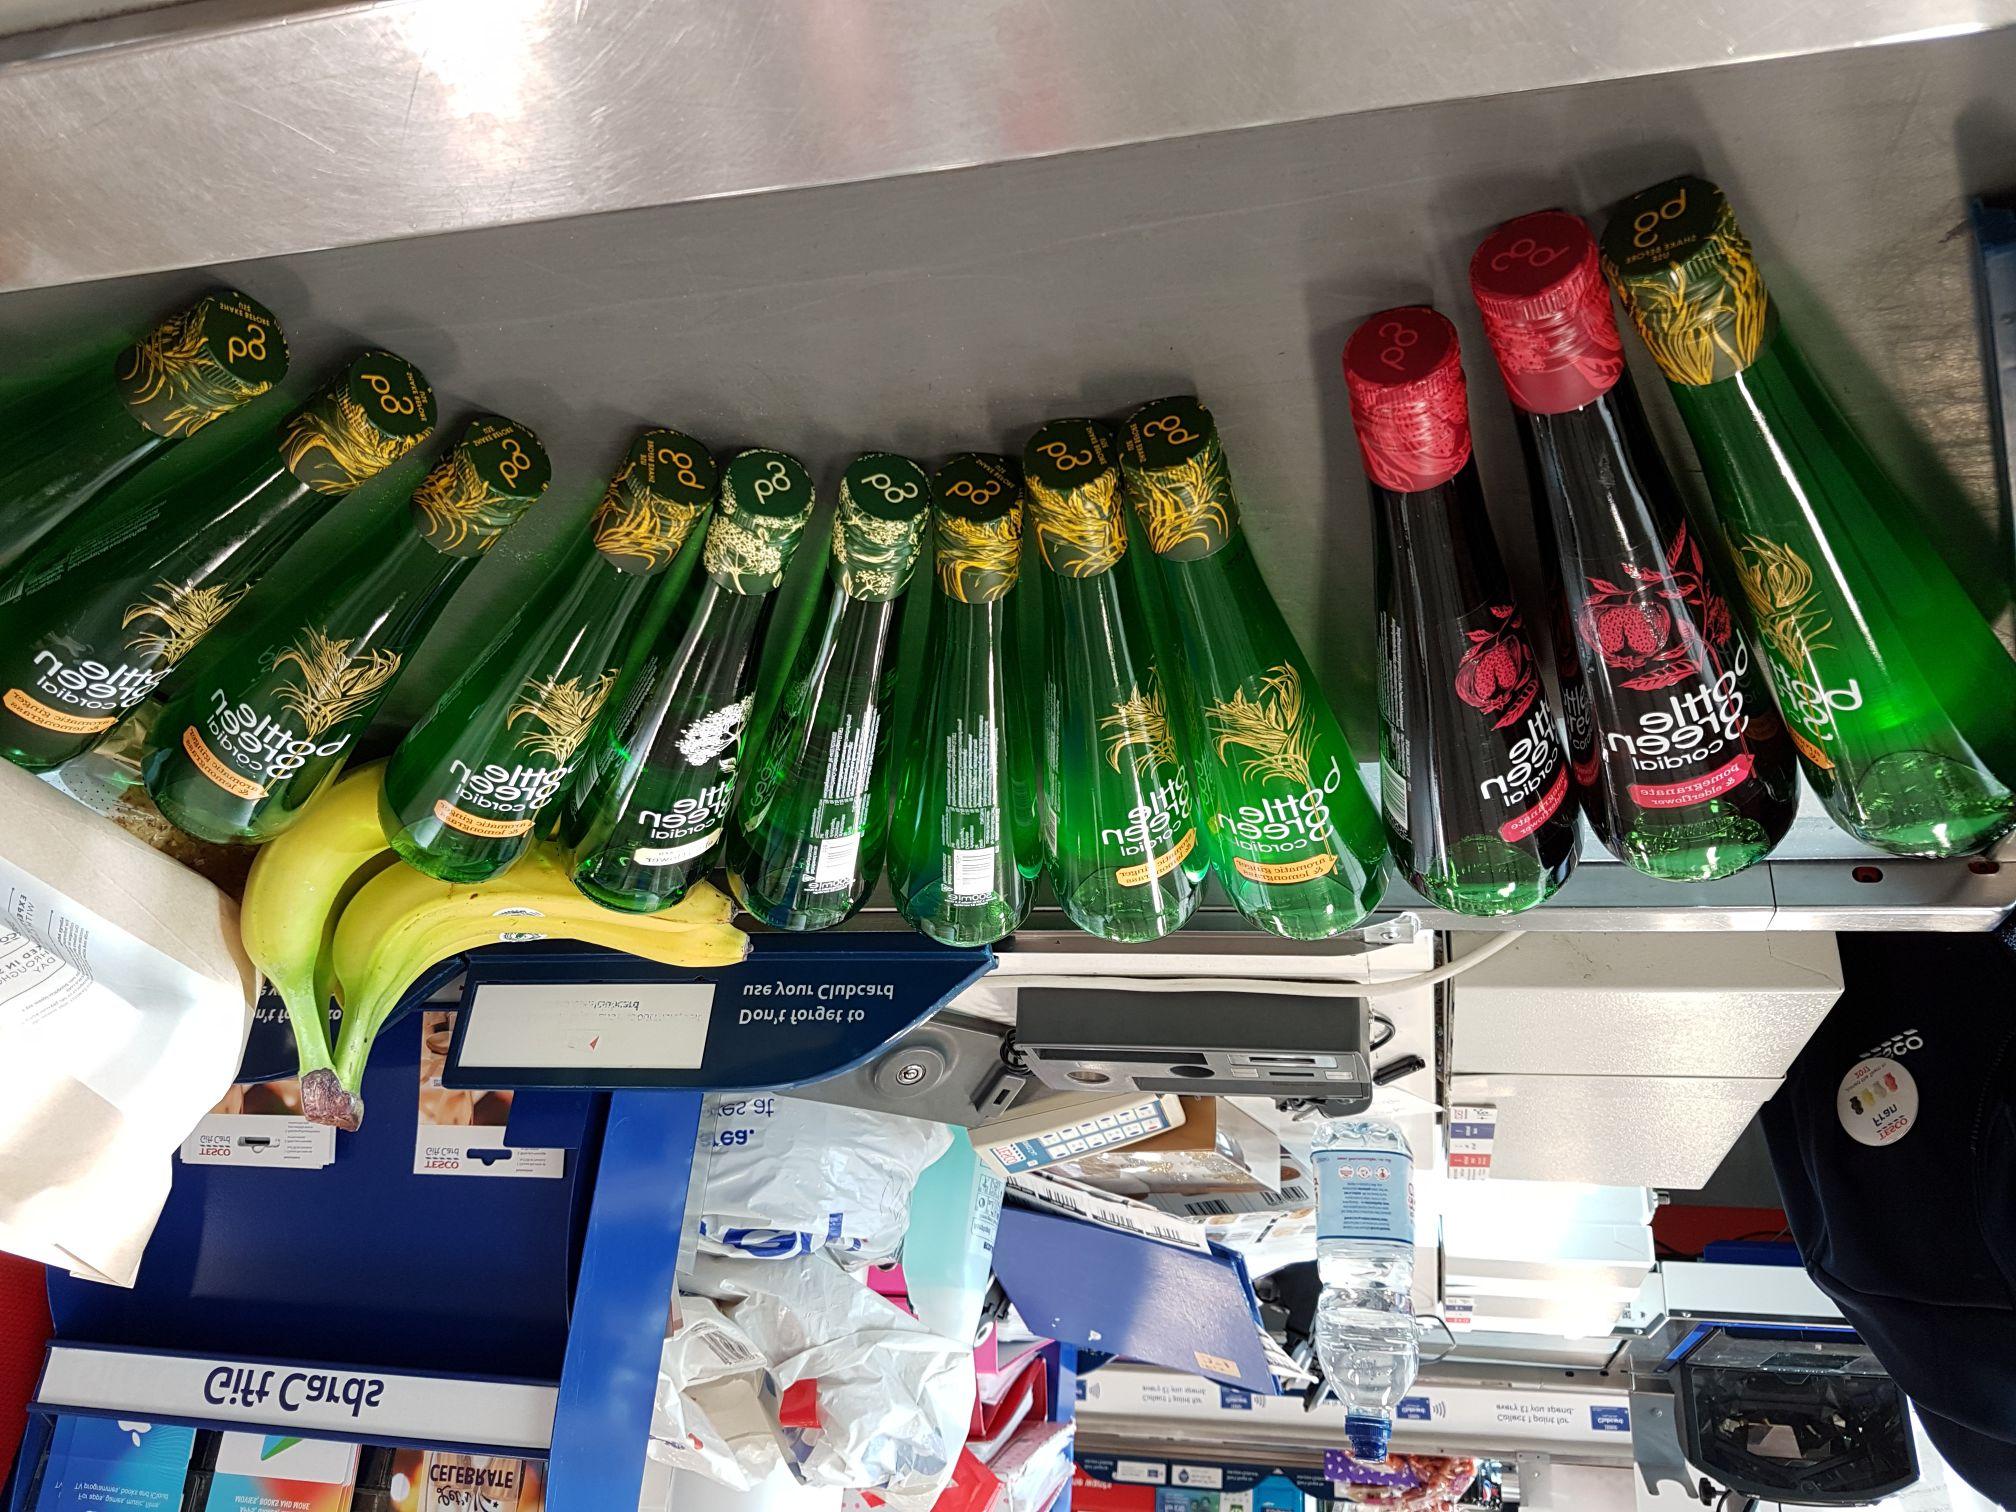 Bottle Green cordial £2 @ Tesco